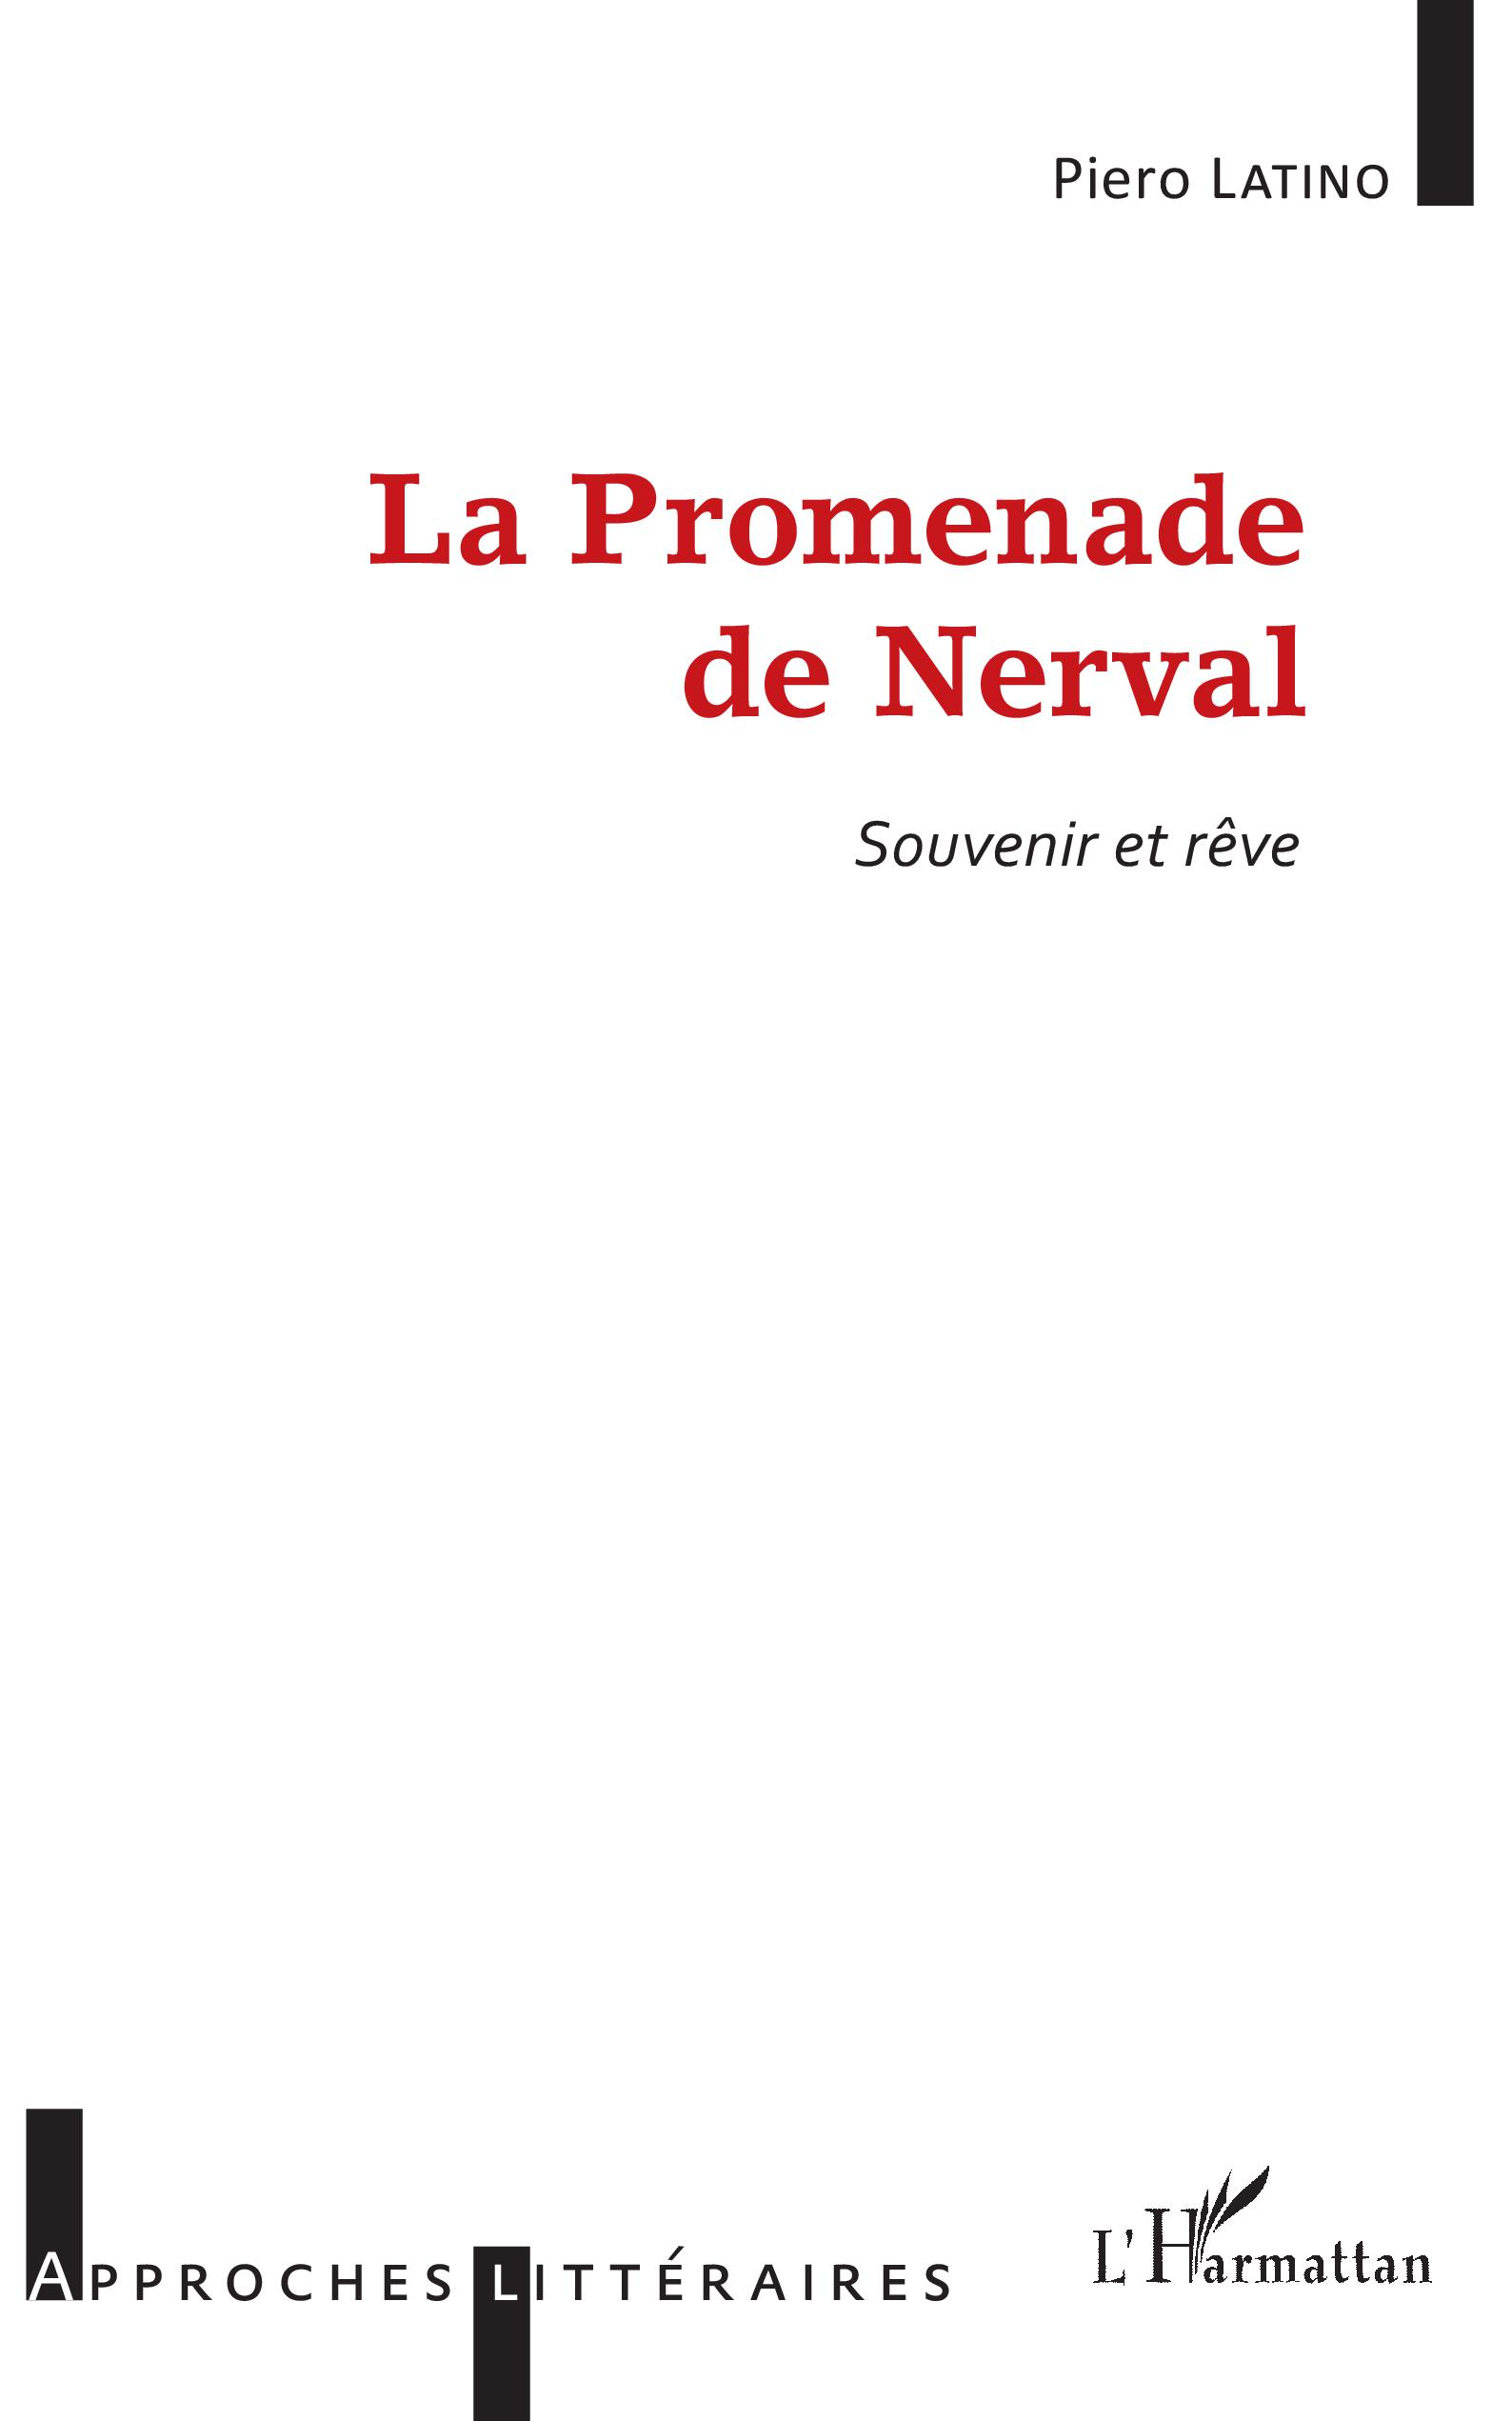 P. Latino, La Promenade de Nerval : souvenir et rêve